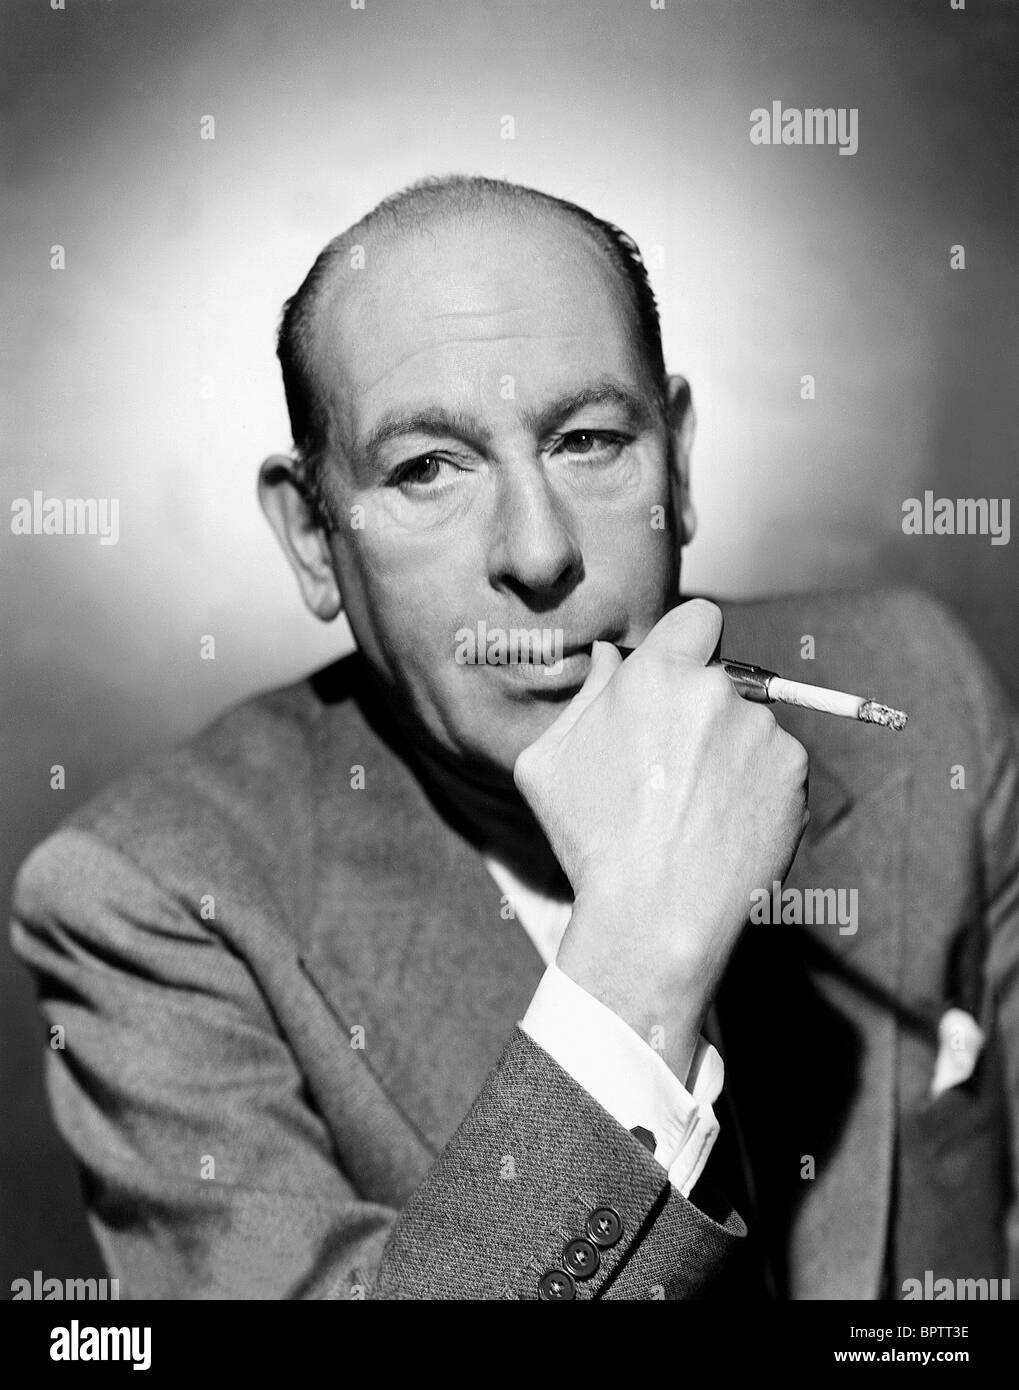 SIR CEDRIC HARDWICKE ACTOR (1948) - Stock Image